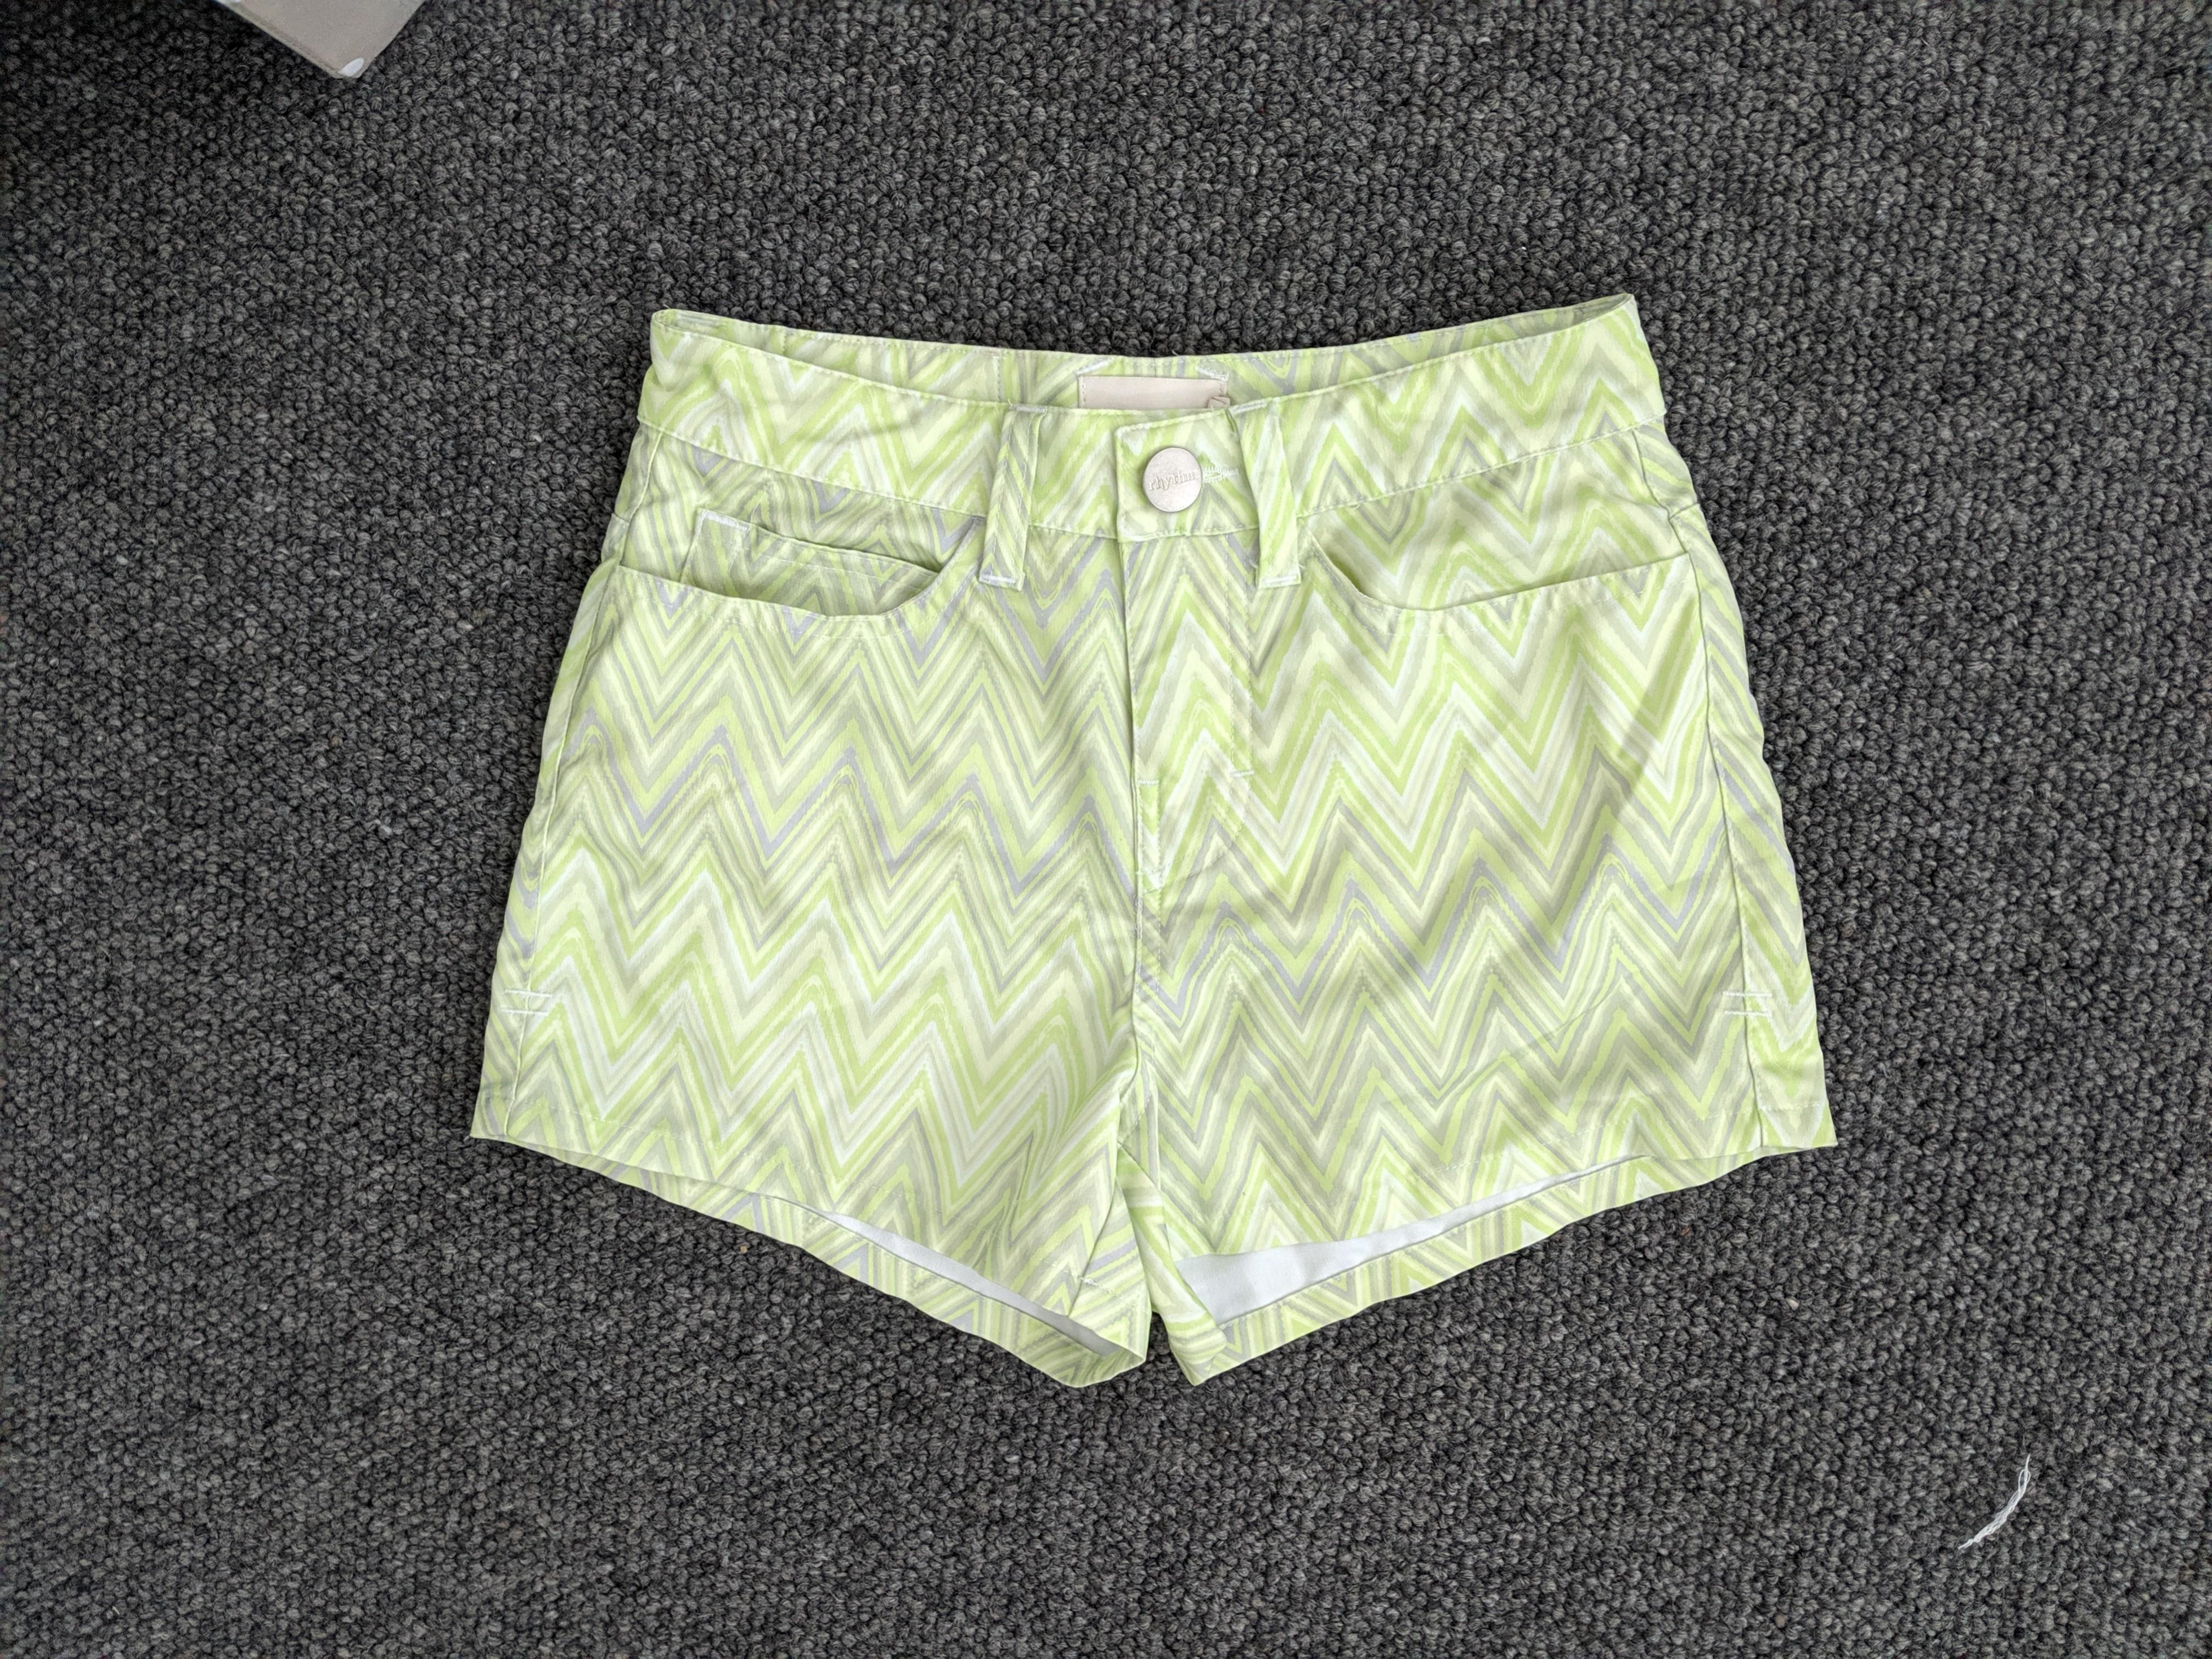 Rhythm - lime green and white chevron patterned short shorts - AU 6